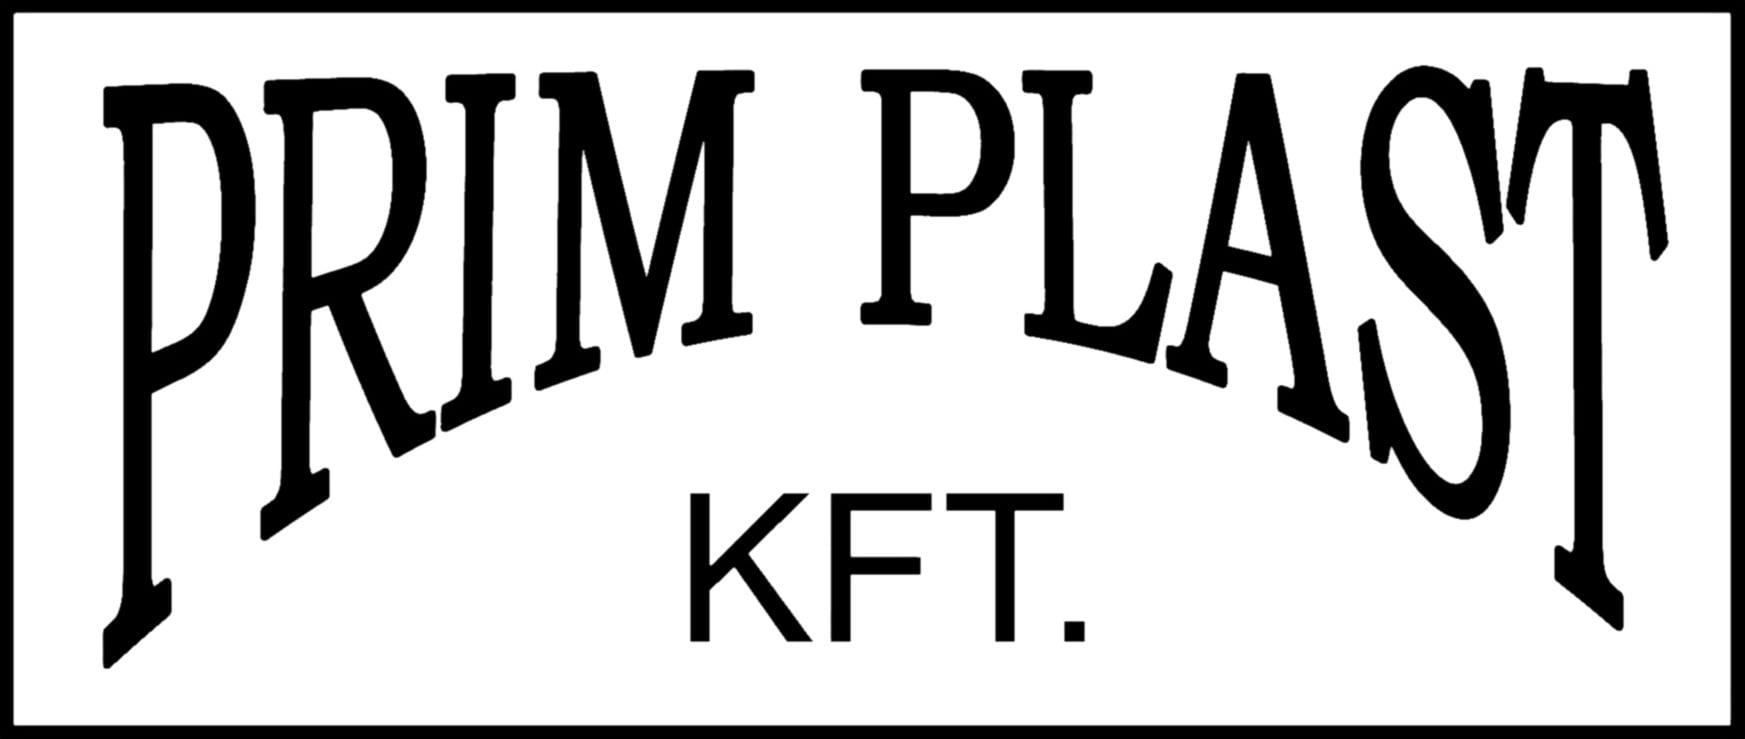 Prim-Plast Kft. logo